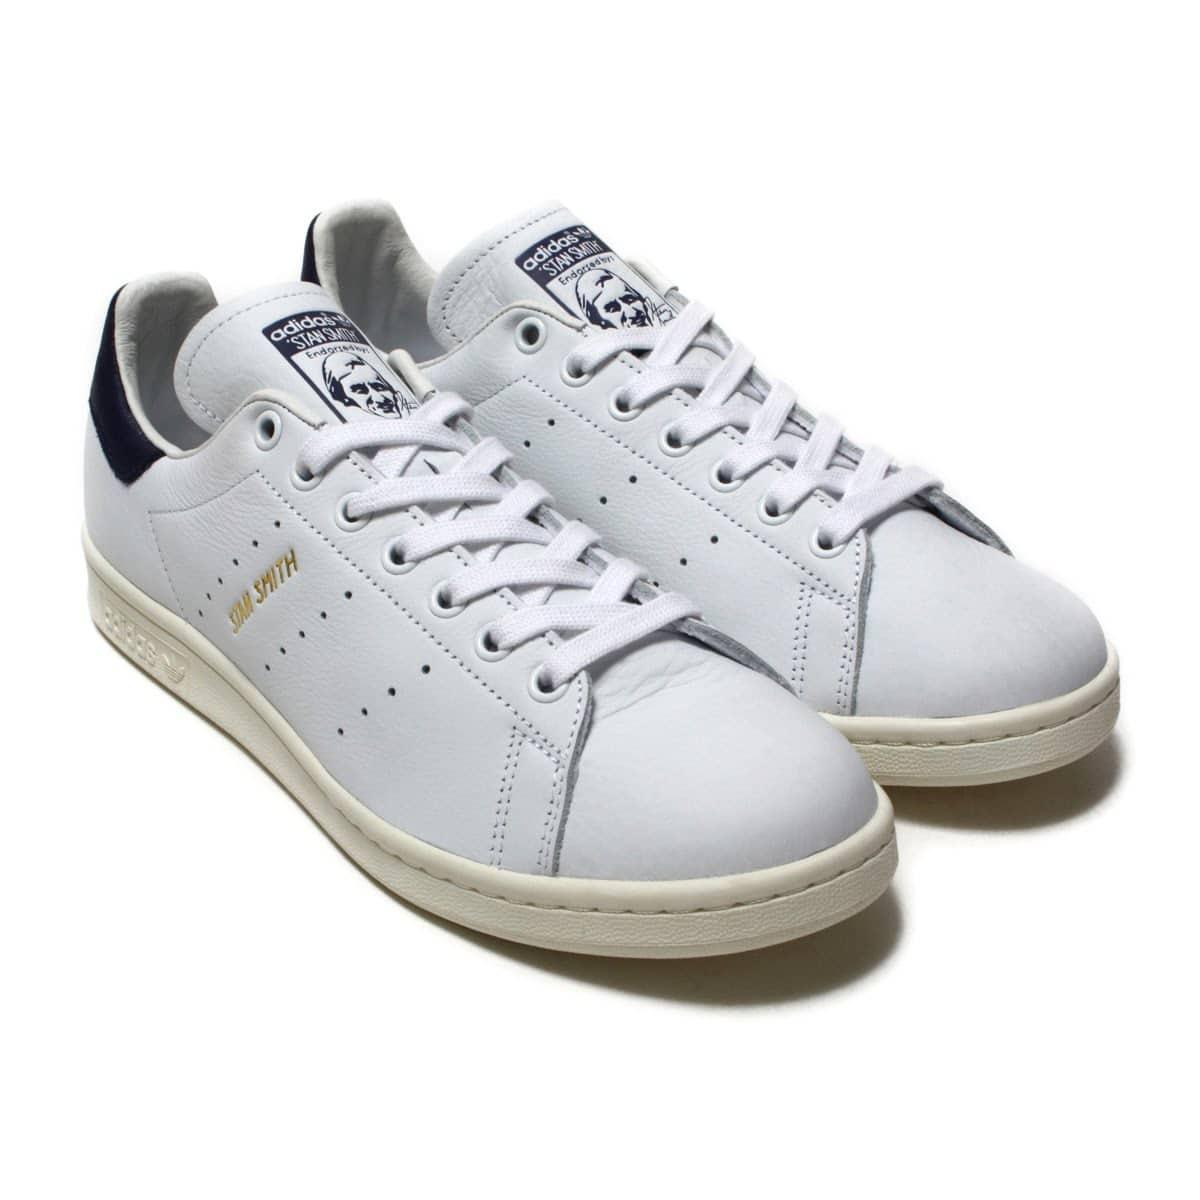 adidas Originals STAN SMITH Running White/Running White/Noble Ink 20SS-I_photo_large